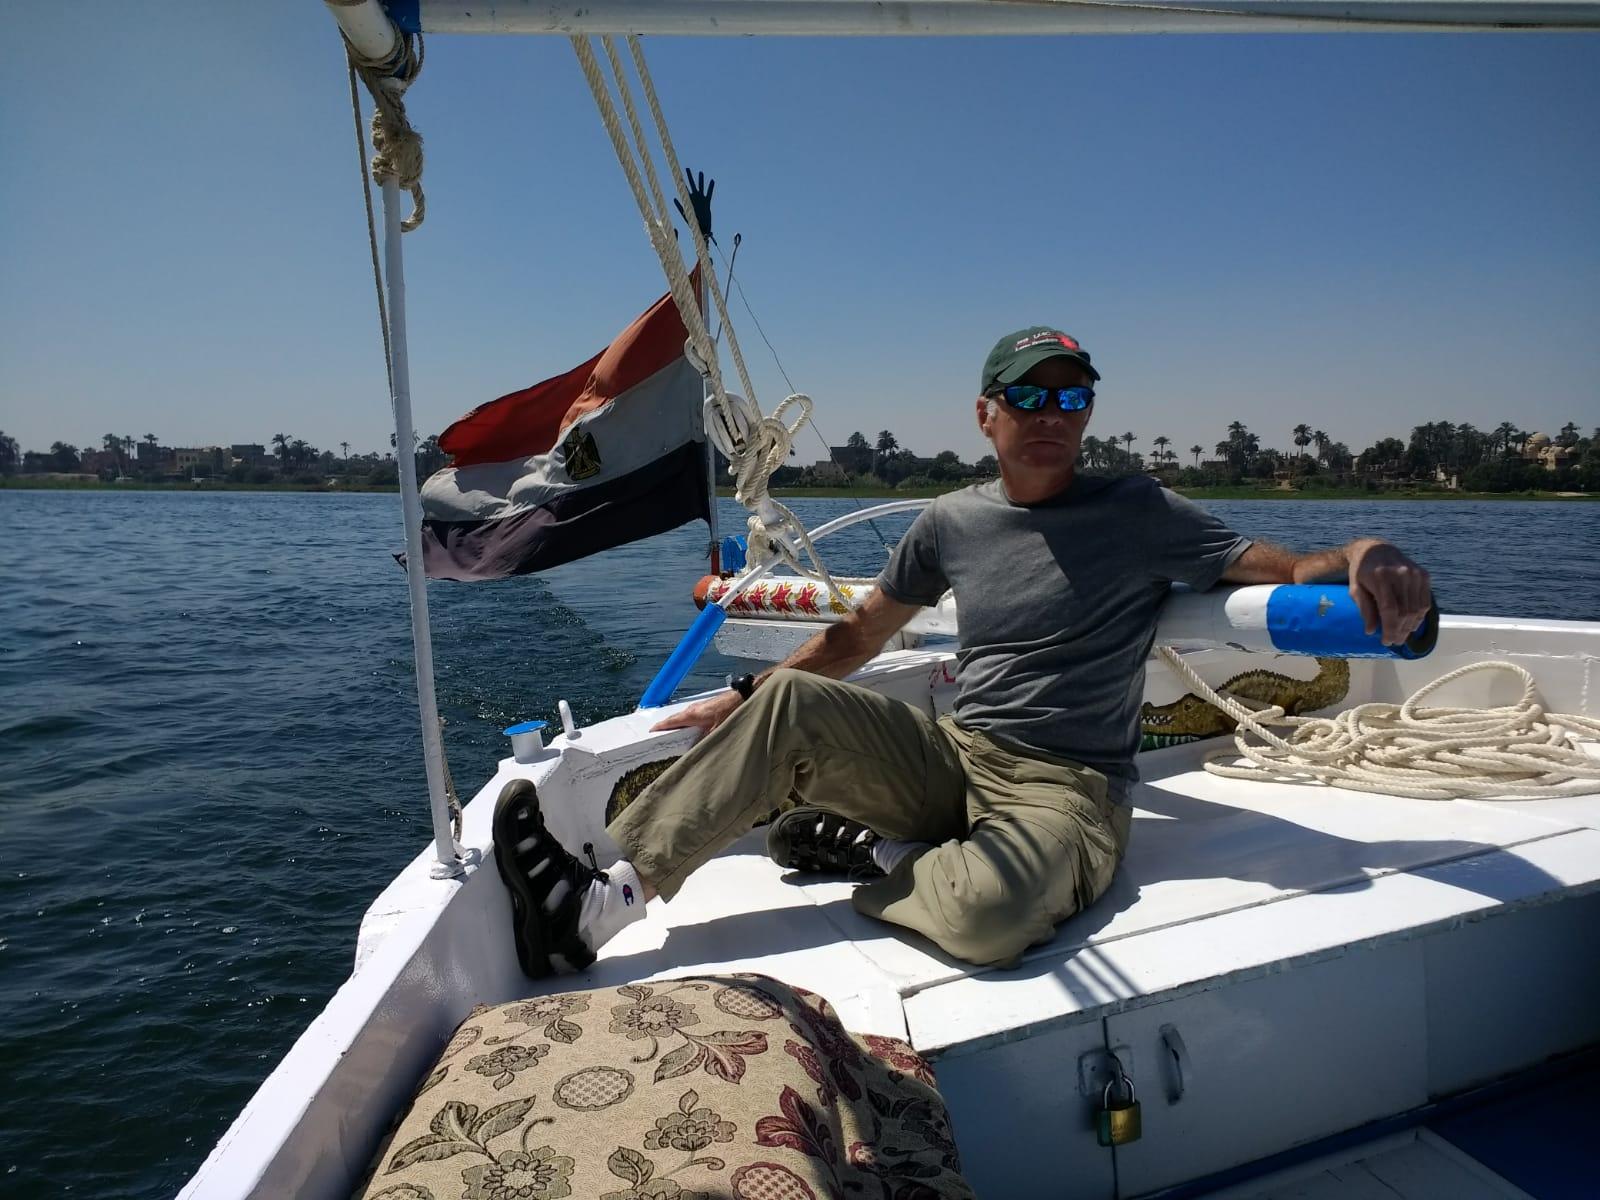 Budget Egypt Tour (luxor-Aswan-Edfu-KomOmbo 5 Star Nile Cruise) 3